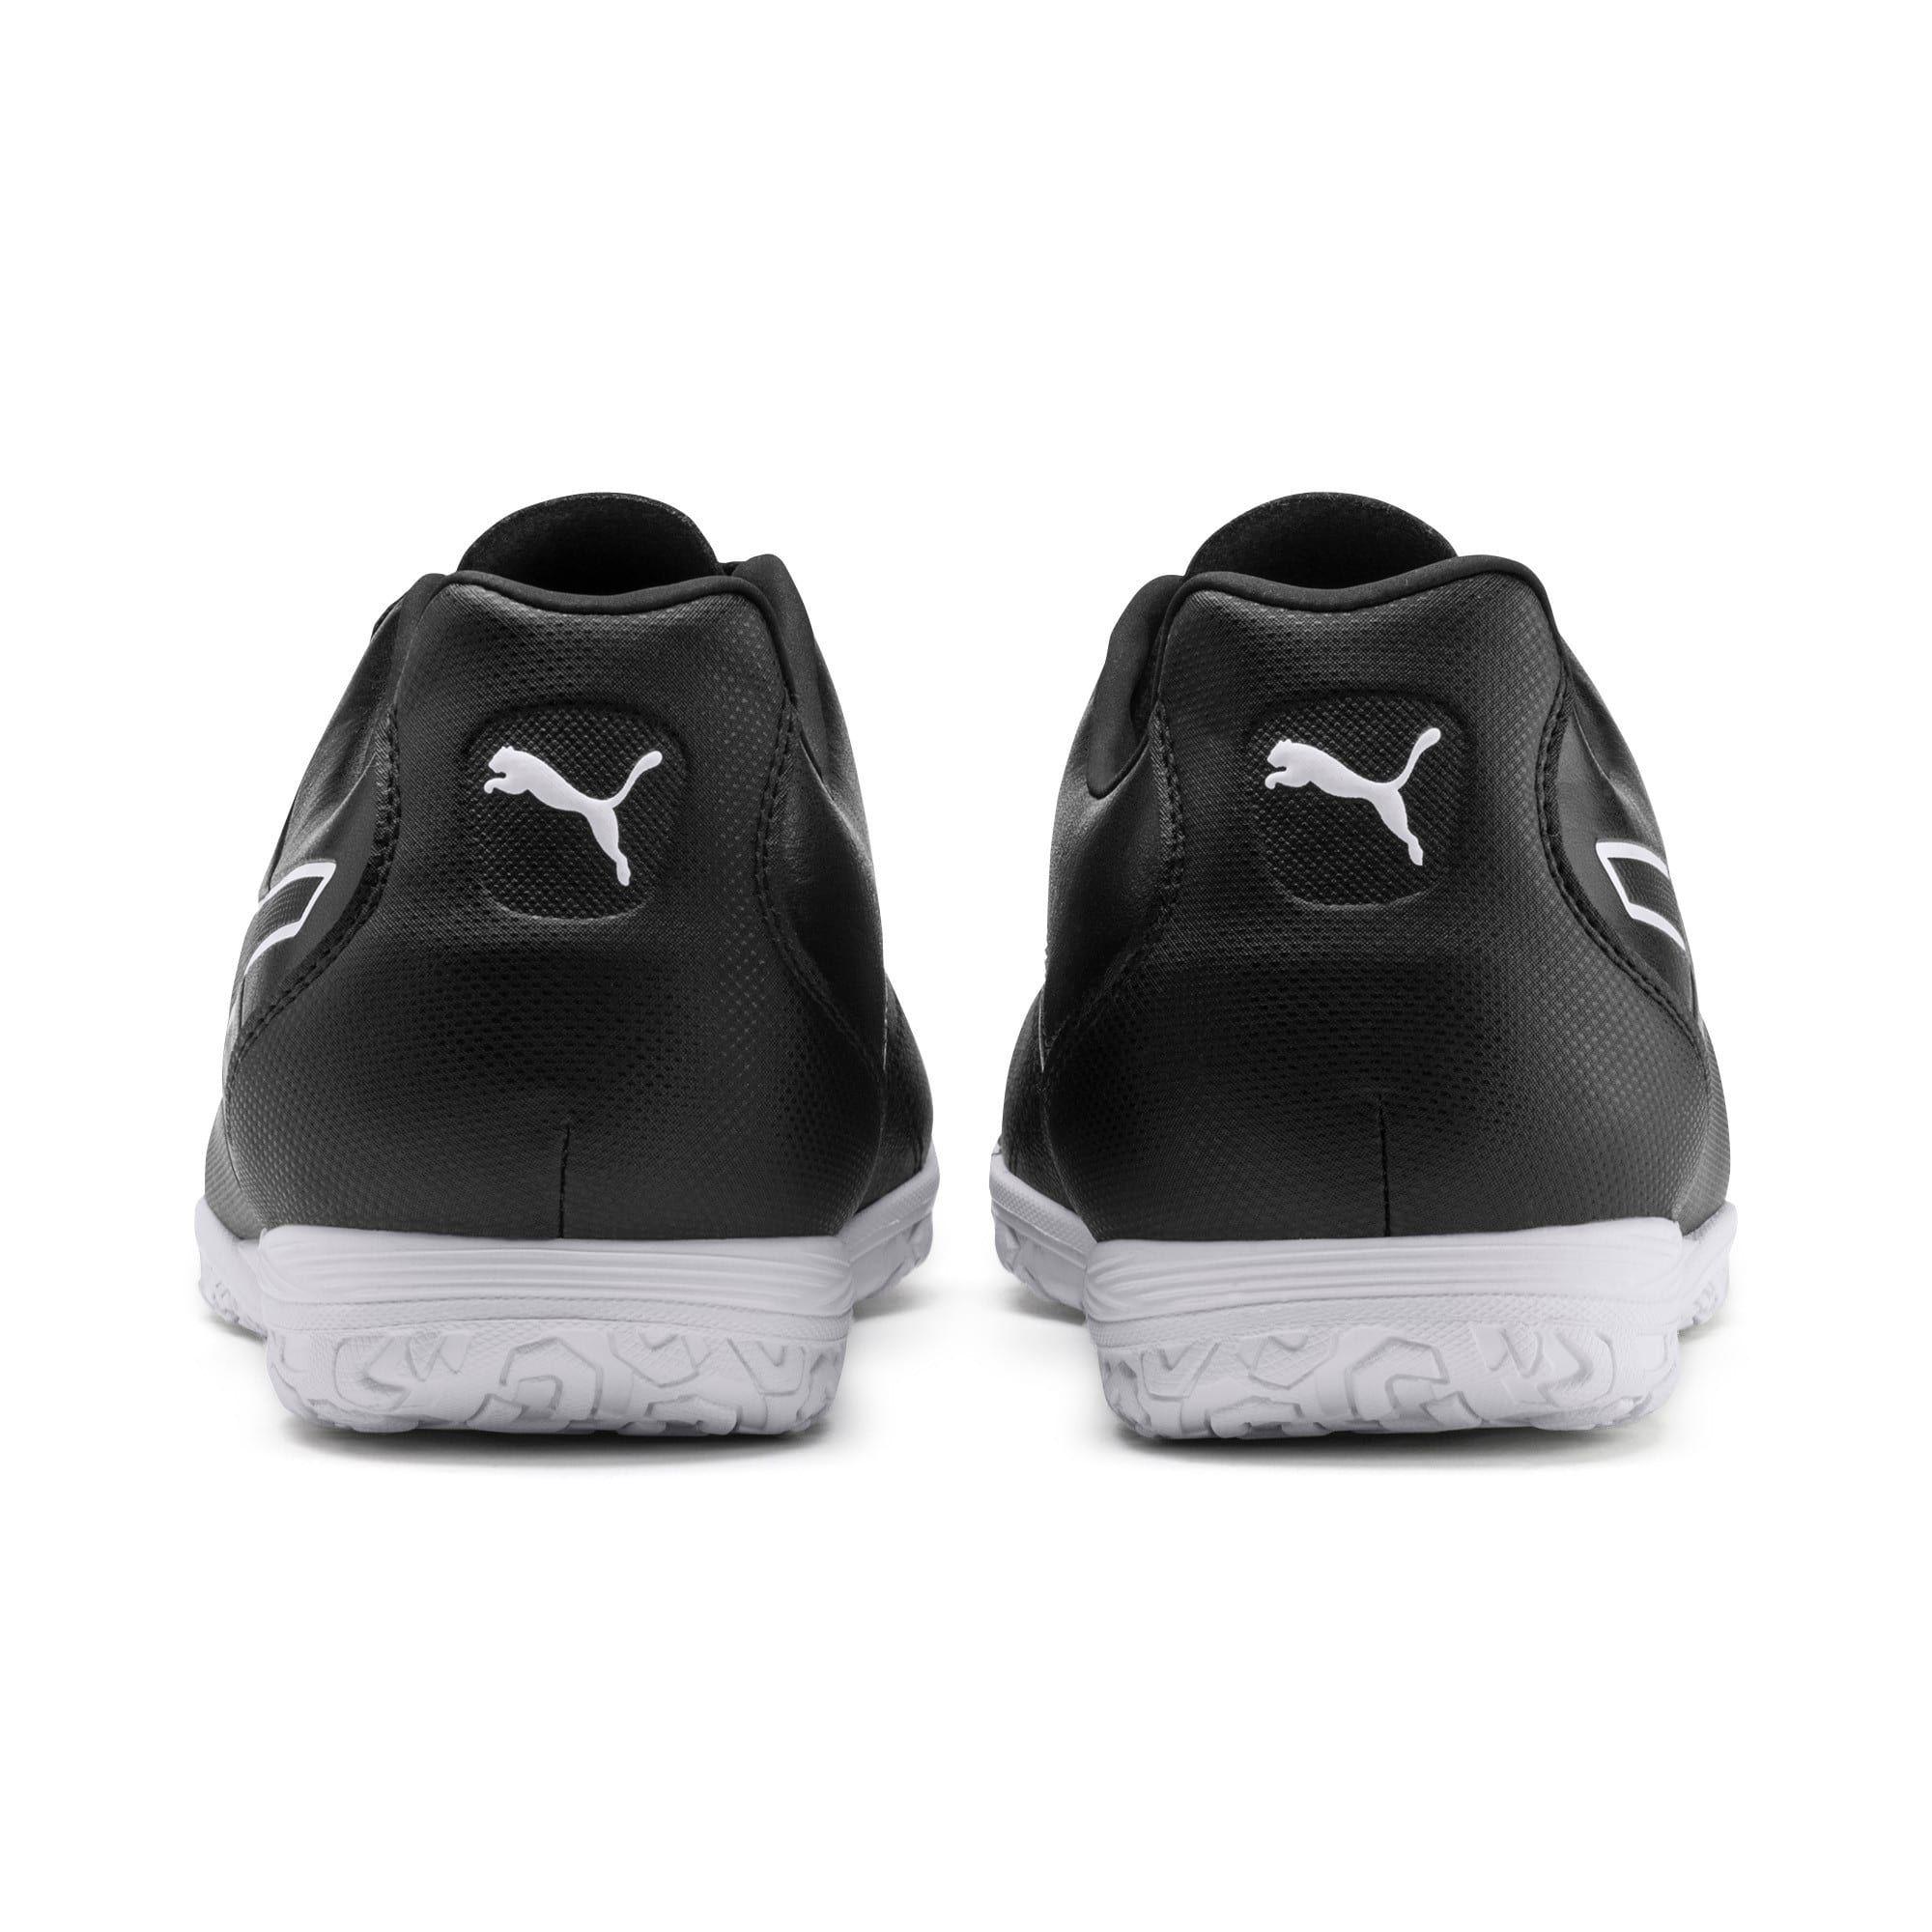 PUMA King Hero IT Football Boots, Black/White, size 6, Shoes